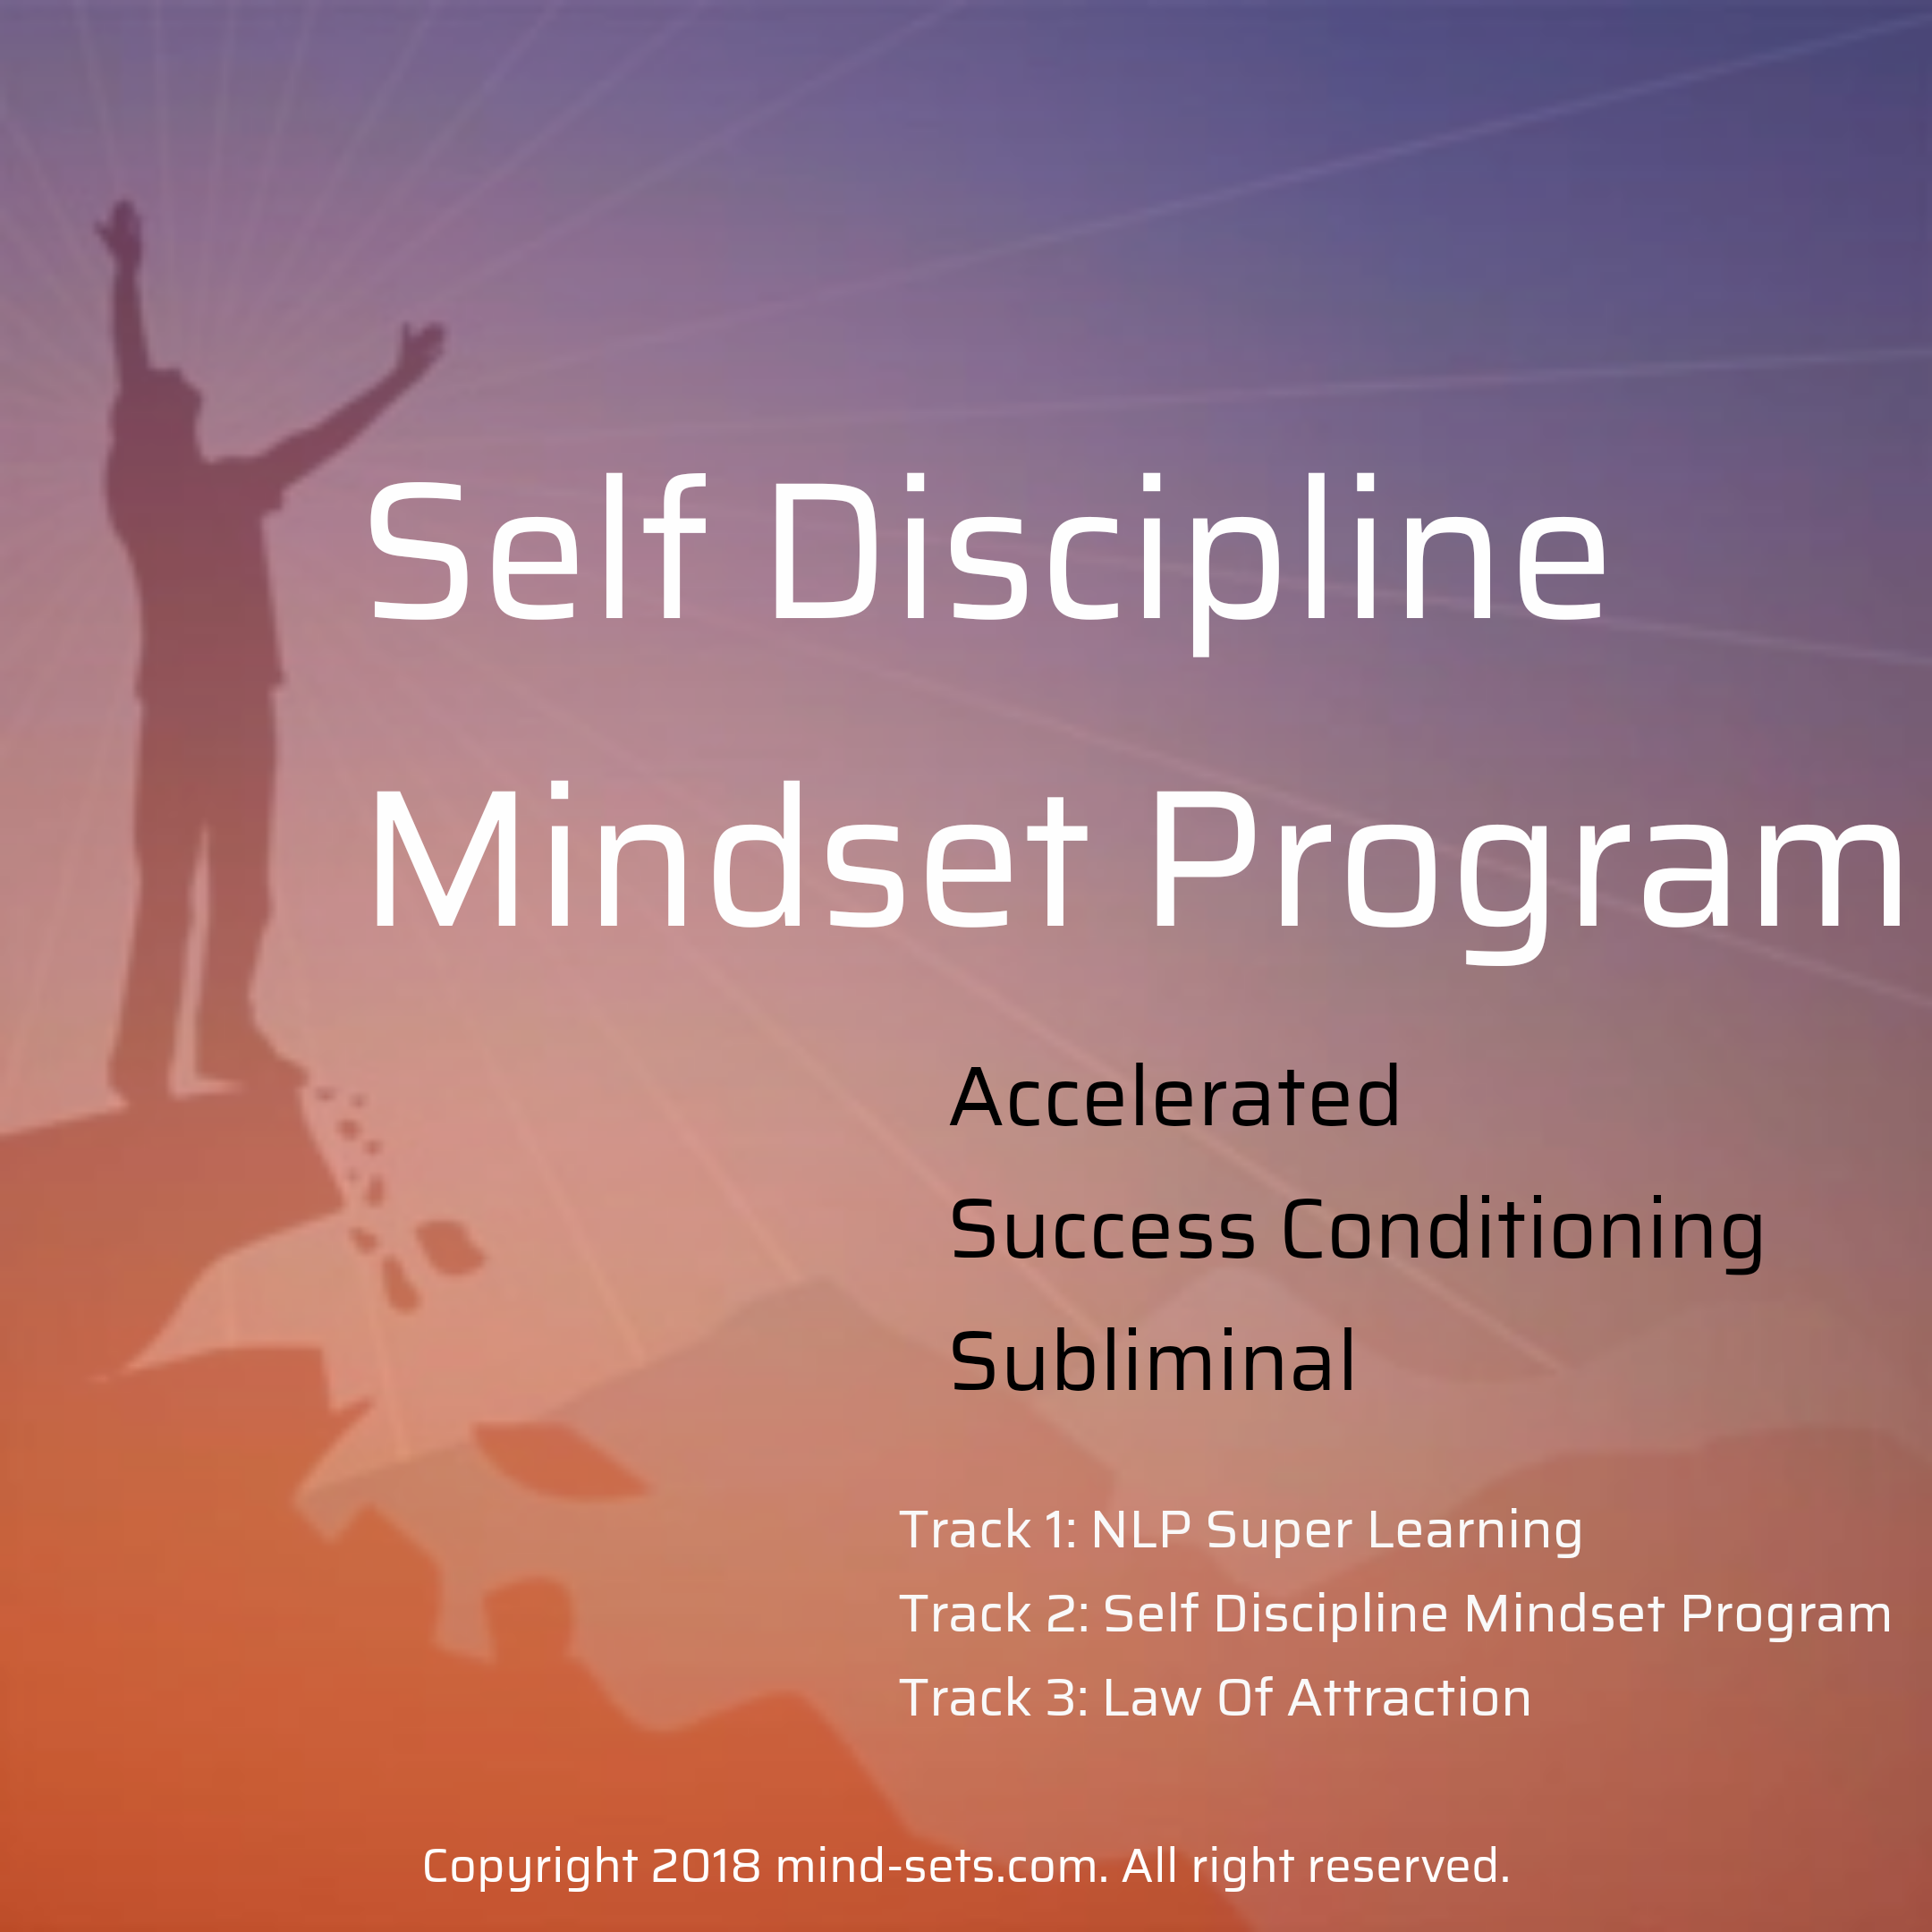 Self Discipline Mindset Program